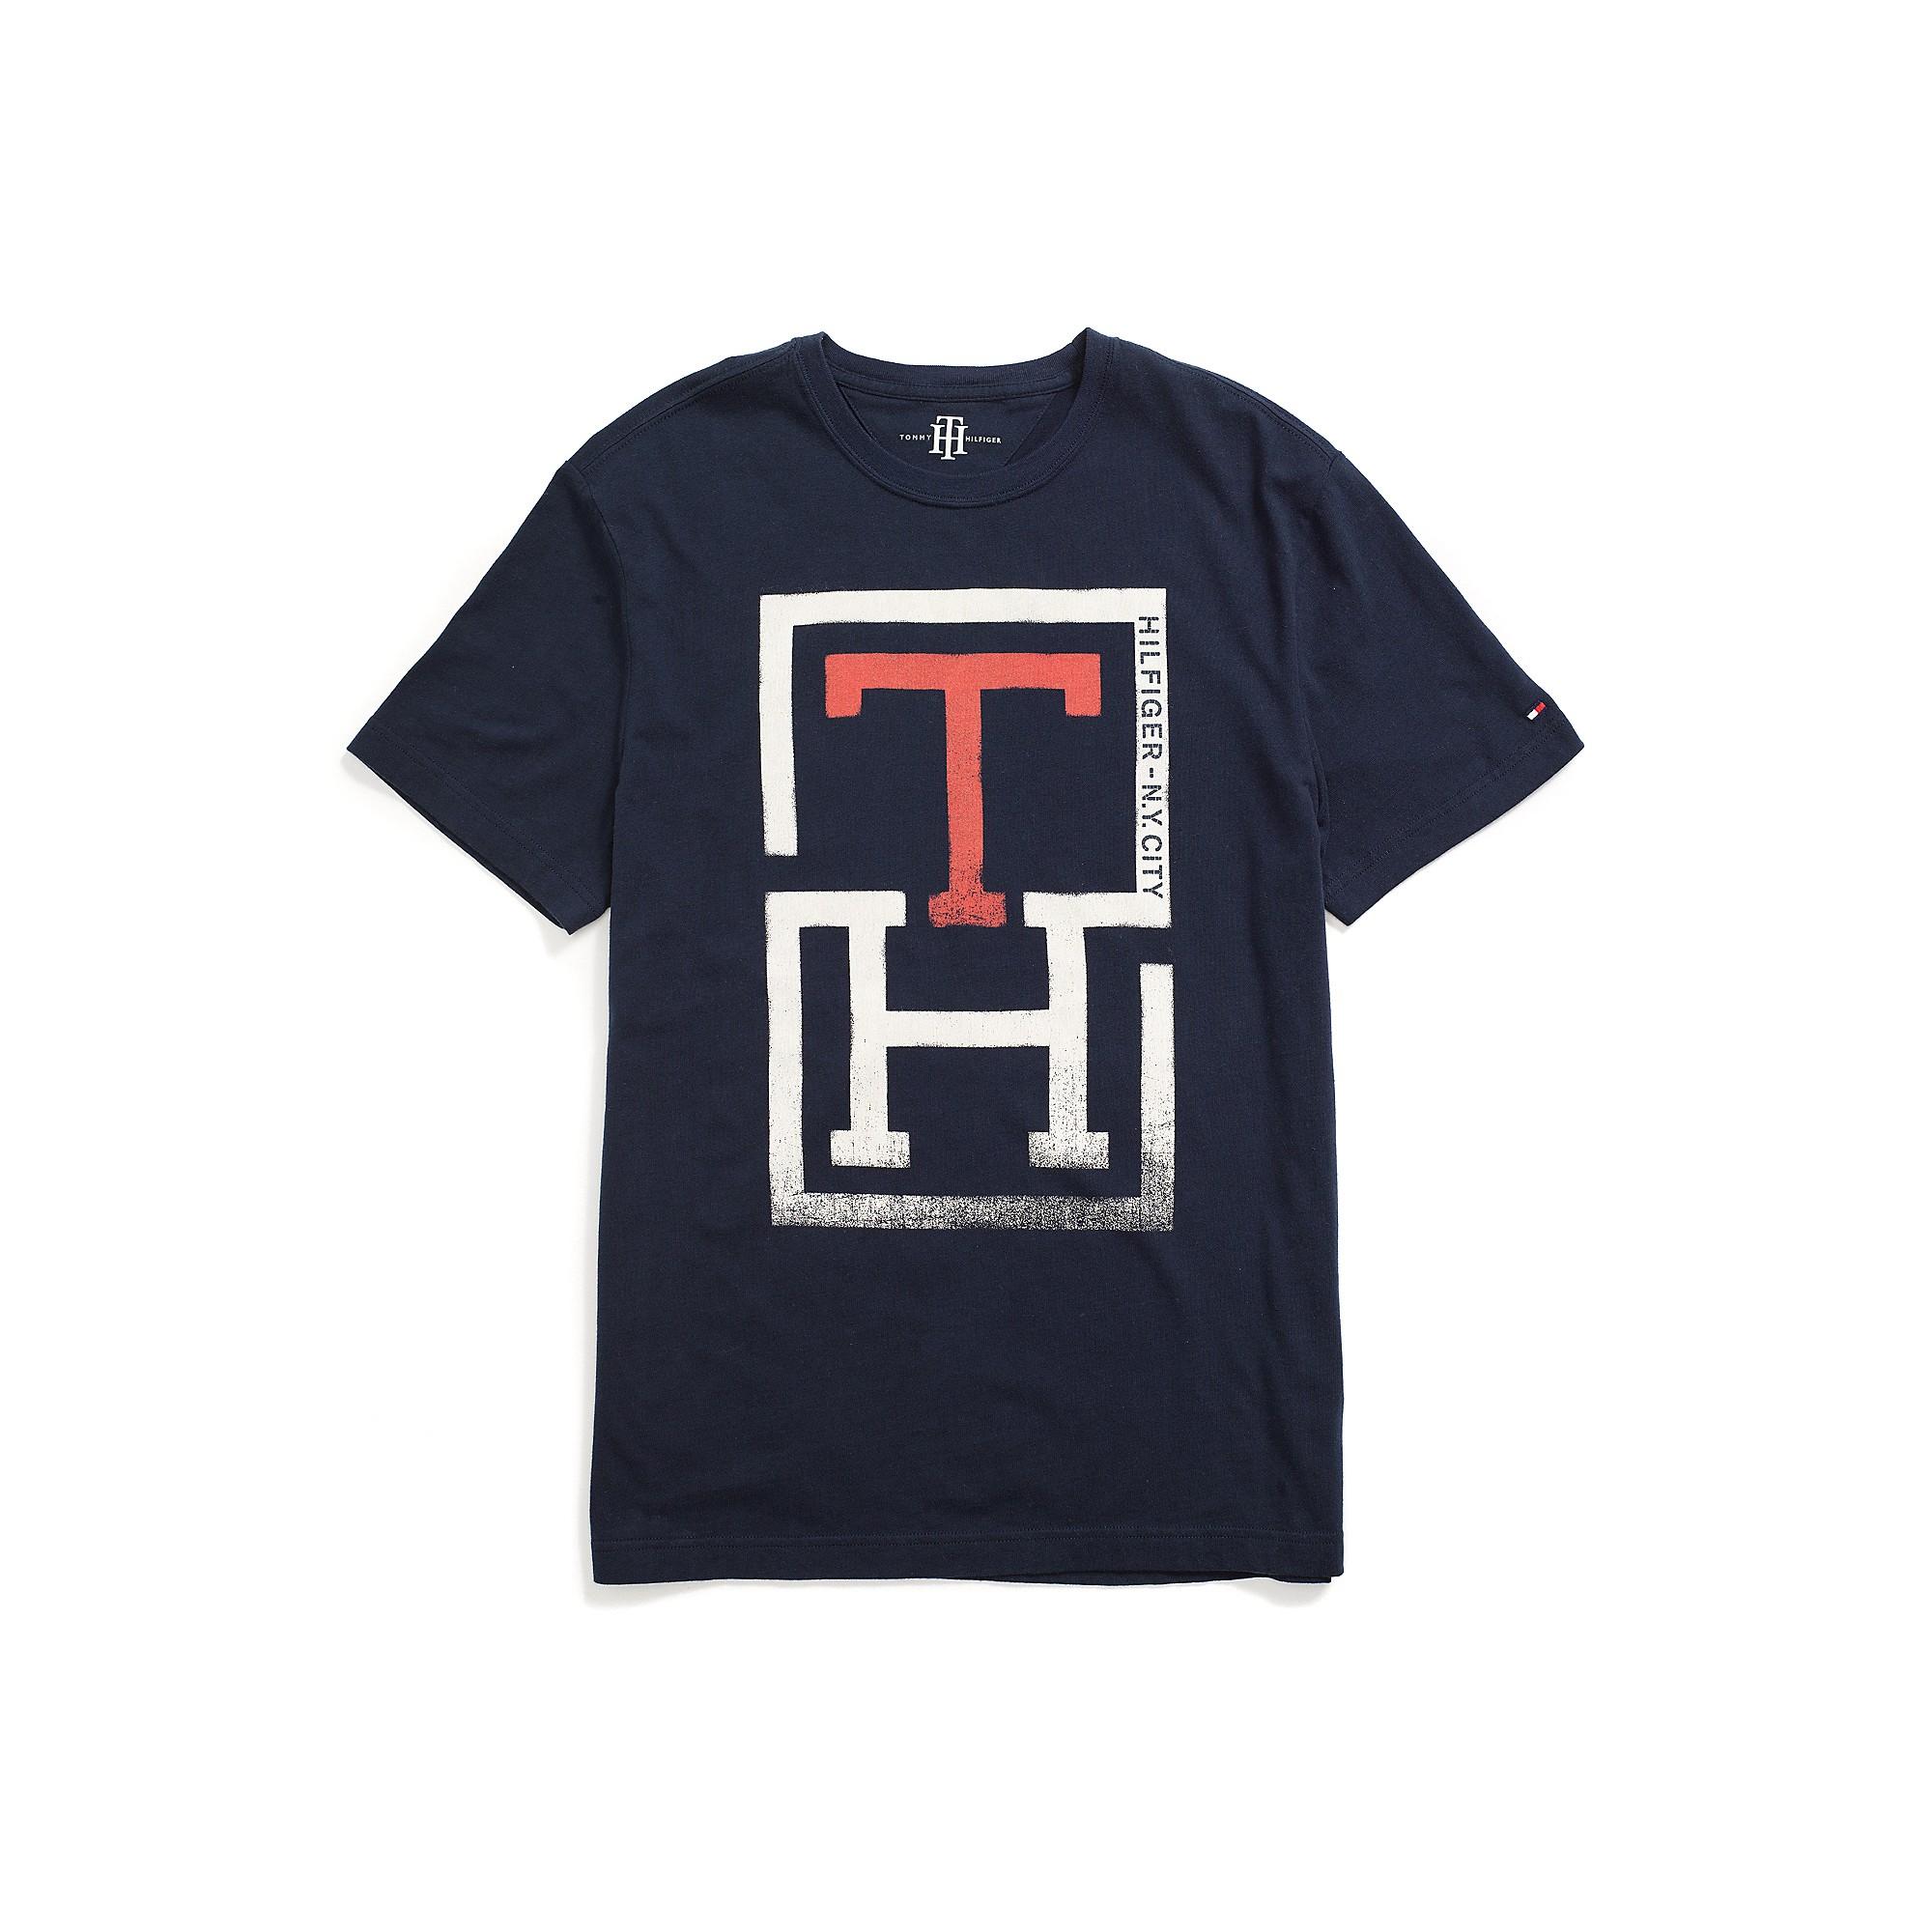 tommy hilfiger th logo tee in blue for men core navy lyst. Black Bedroom Furniture Sets. Home Design Ideas